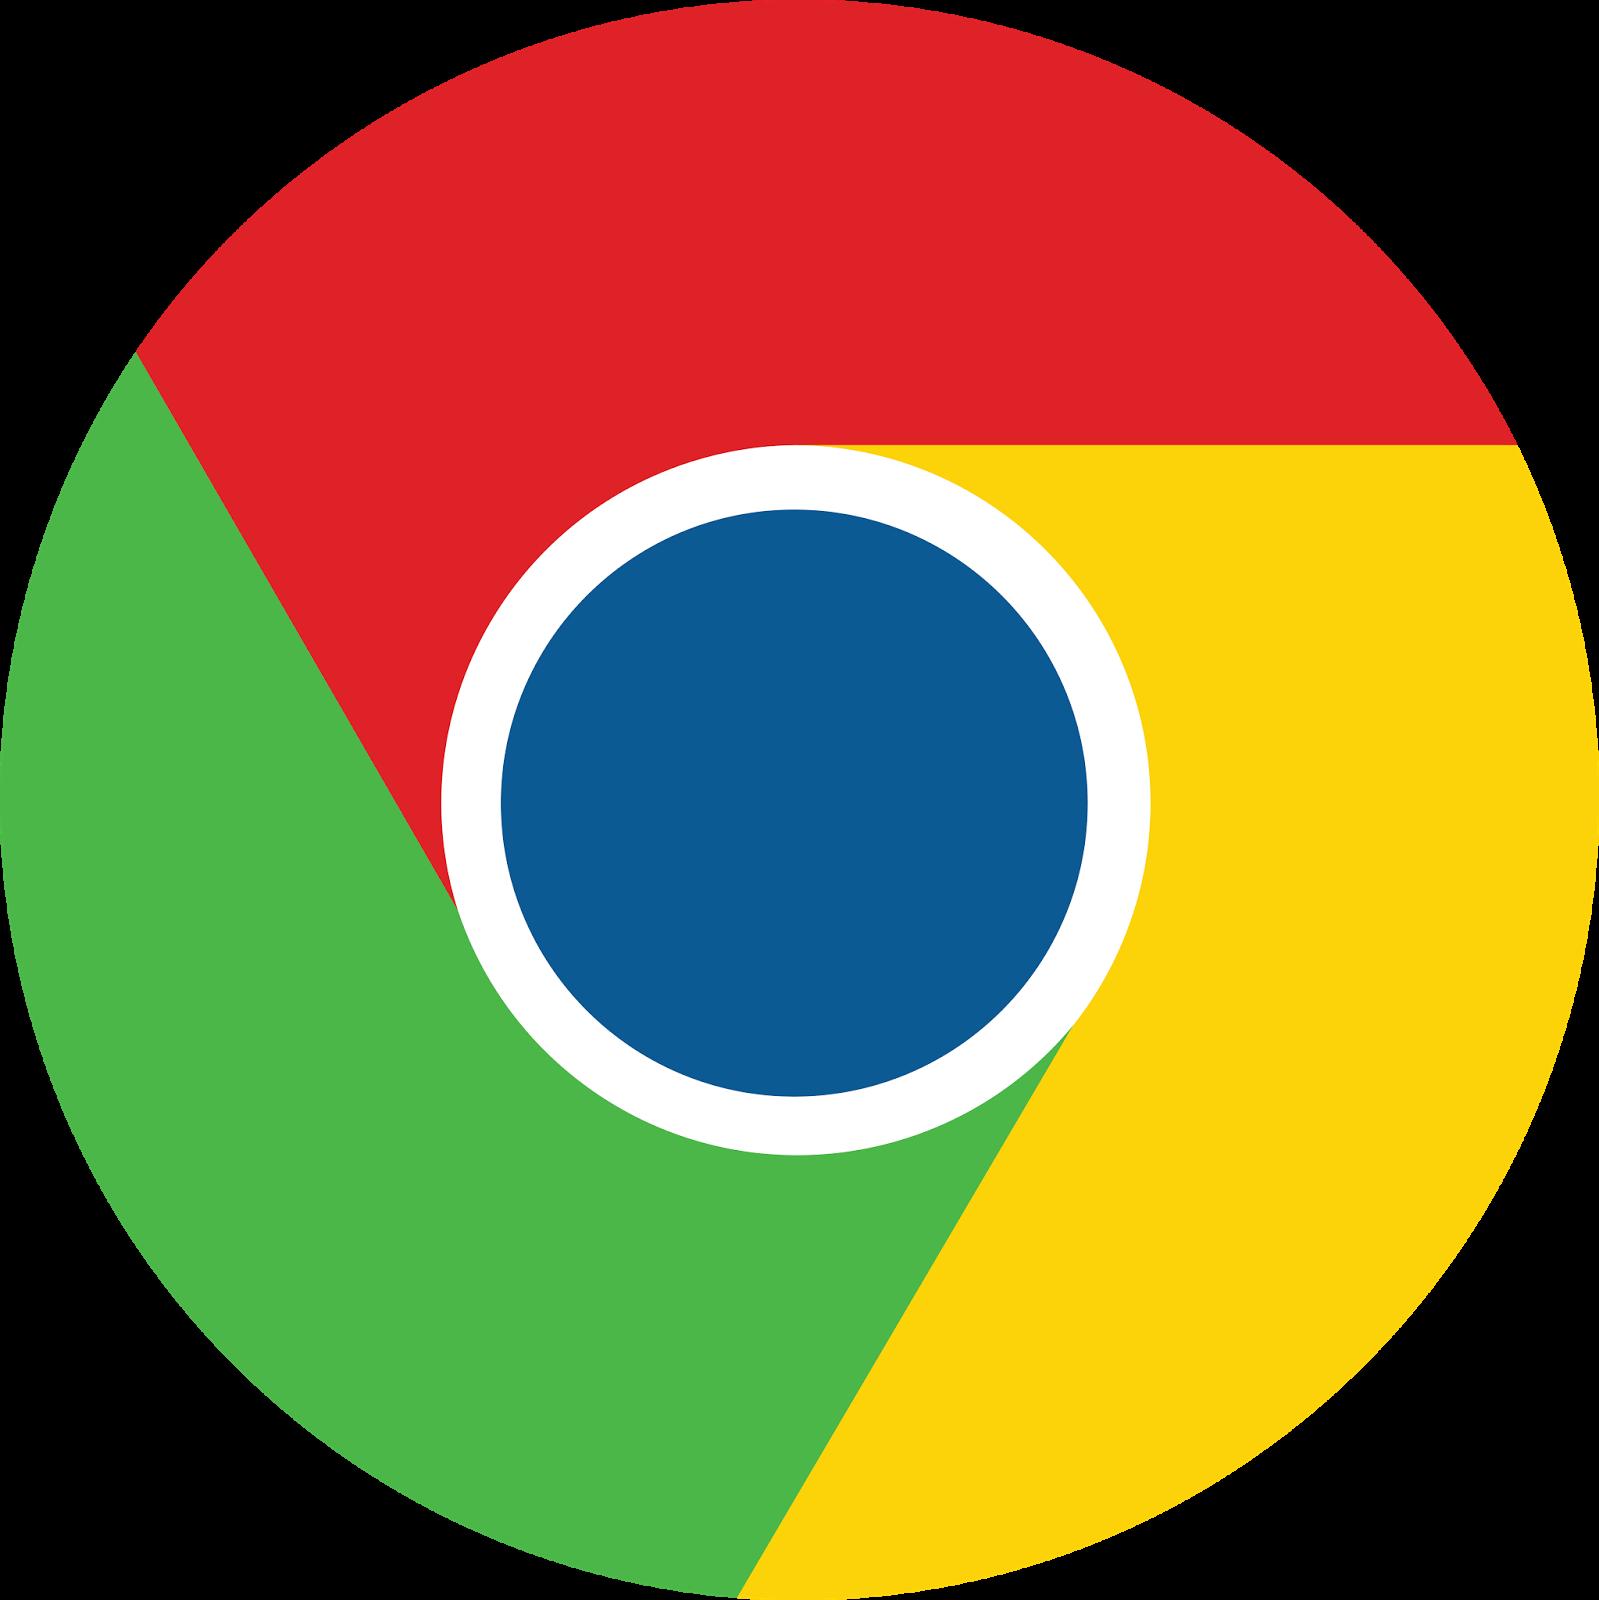 flat google logo png 10 free Cliparts | Download images on ... - Google Logo Images Free